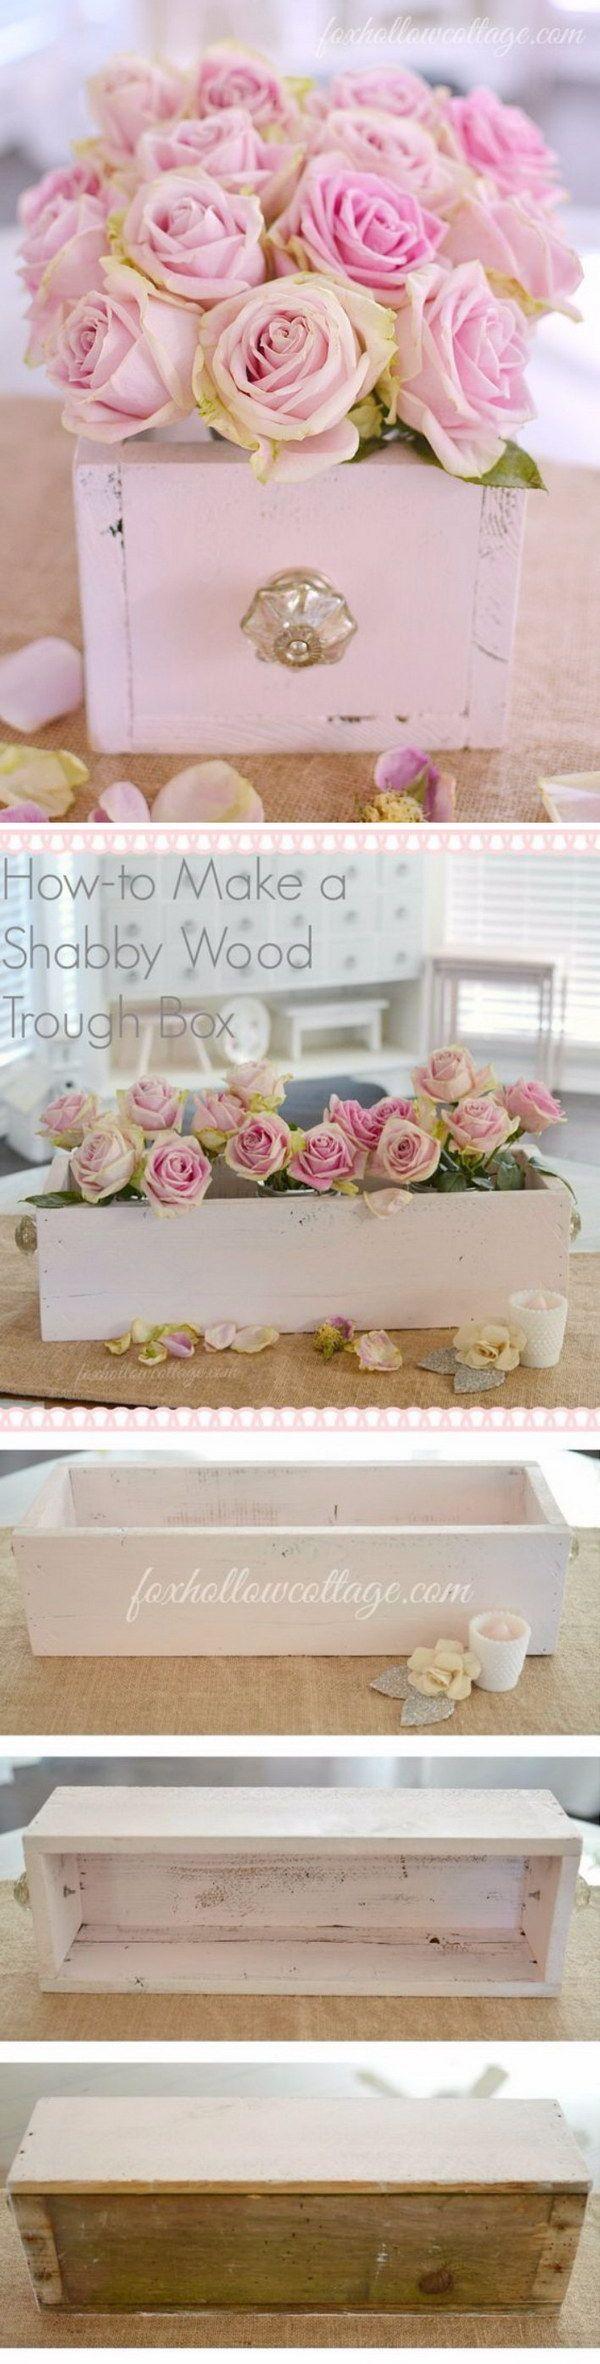 Shabby Chic Wood Trough Box